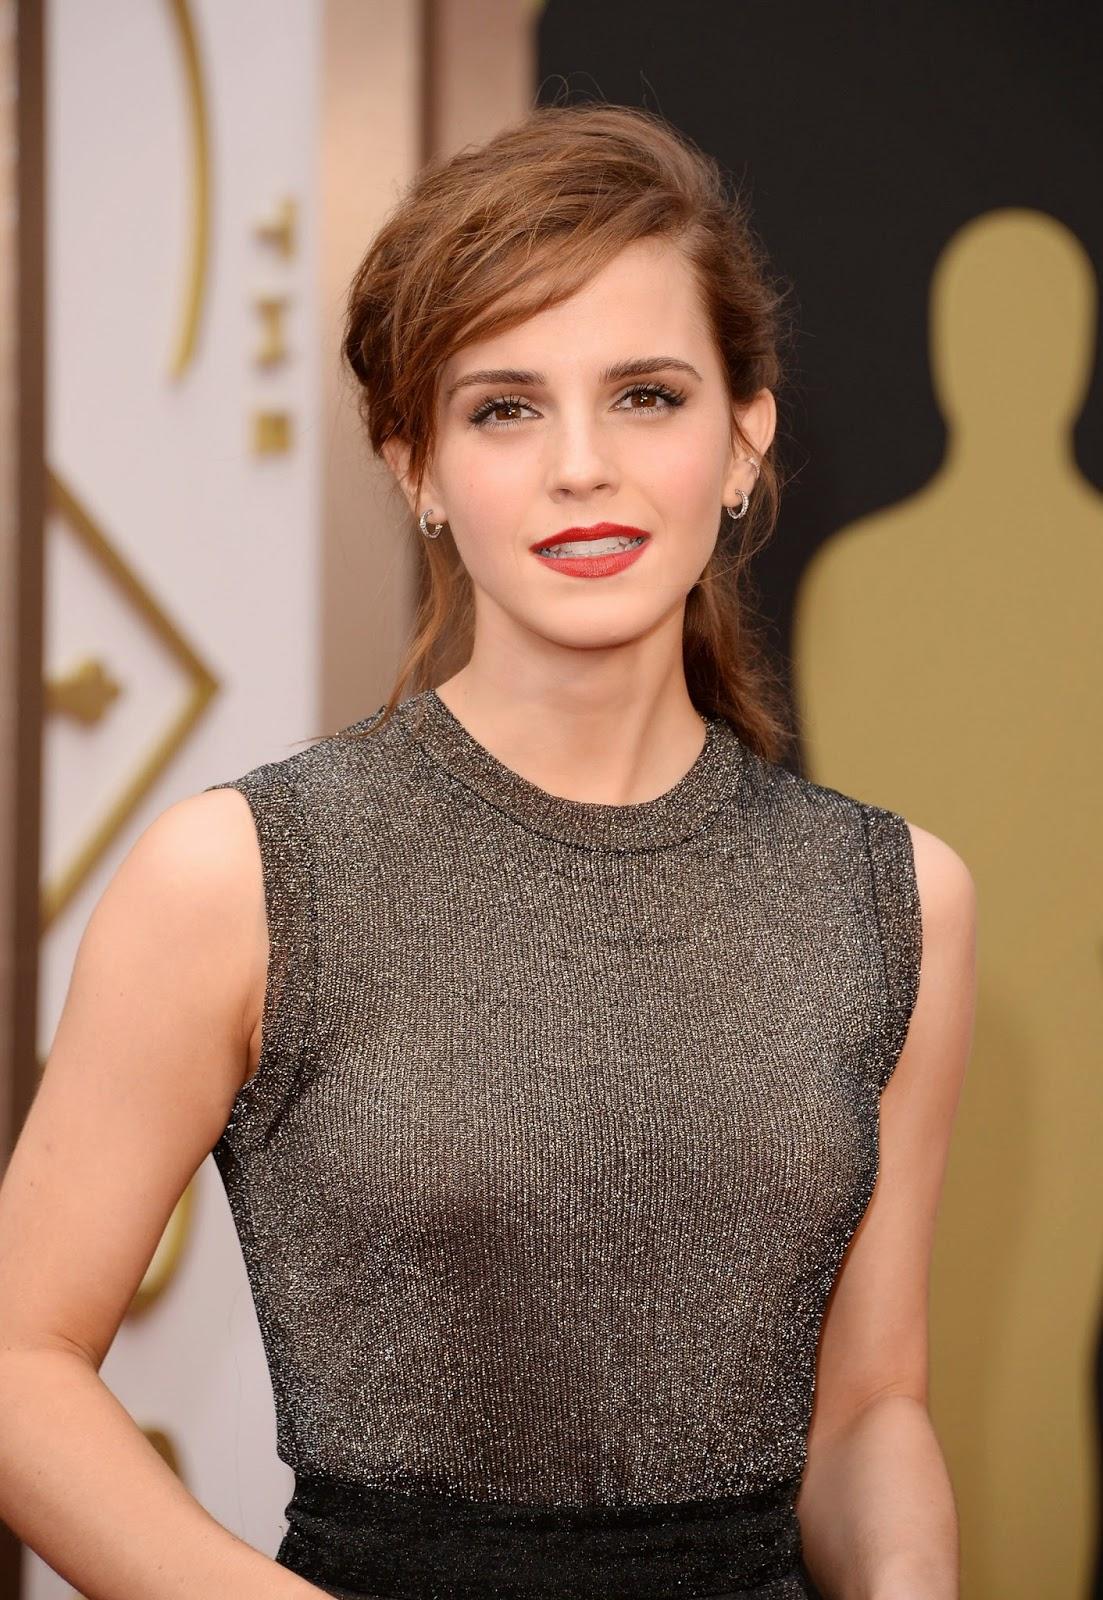 Emma Watson Hd Wallpapers Free Dodnload Emma Watson Photos